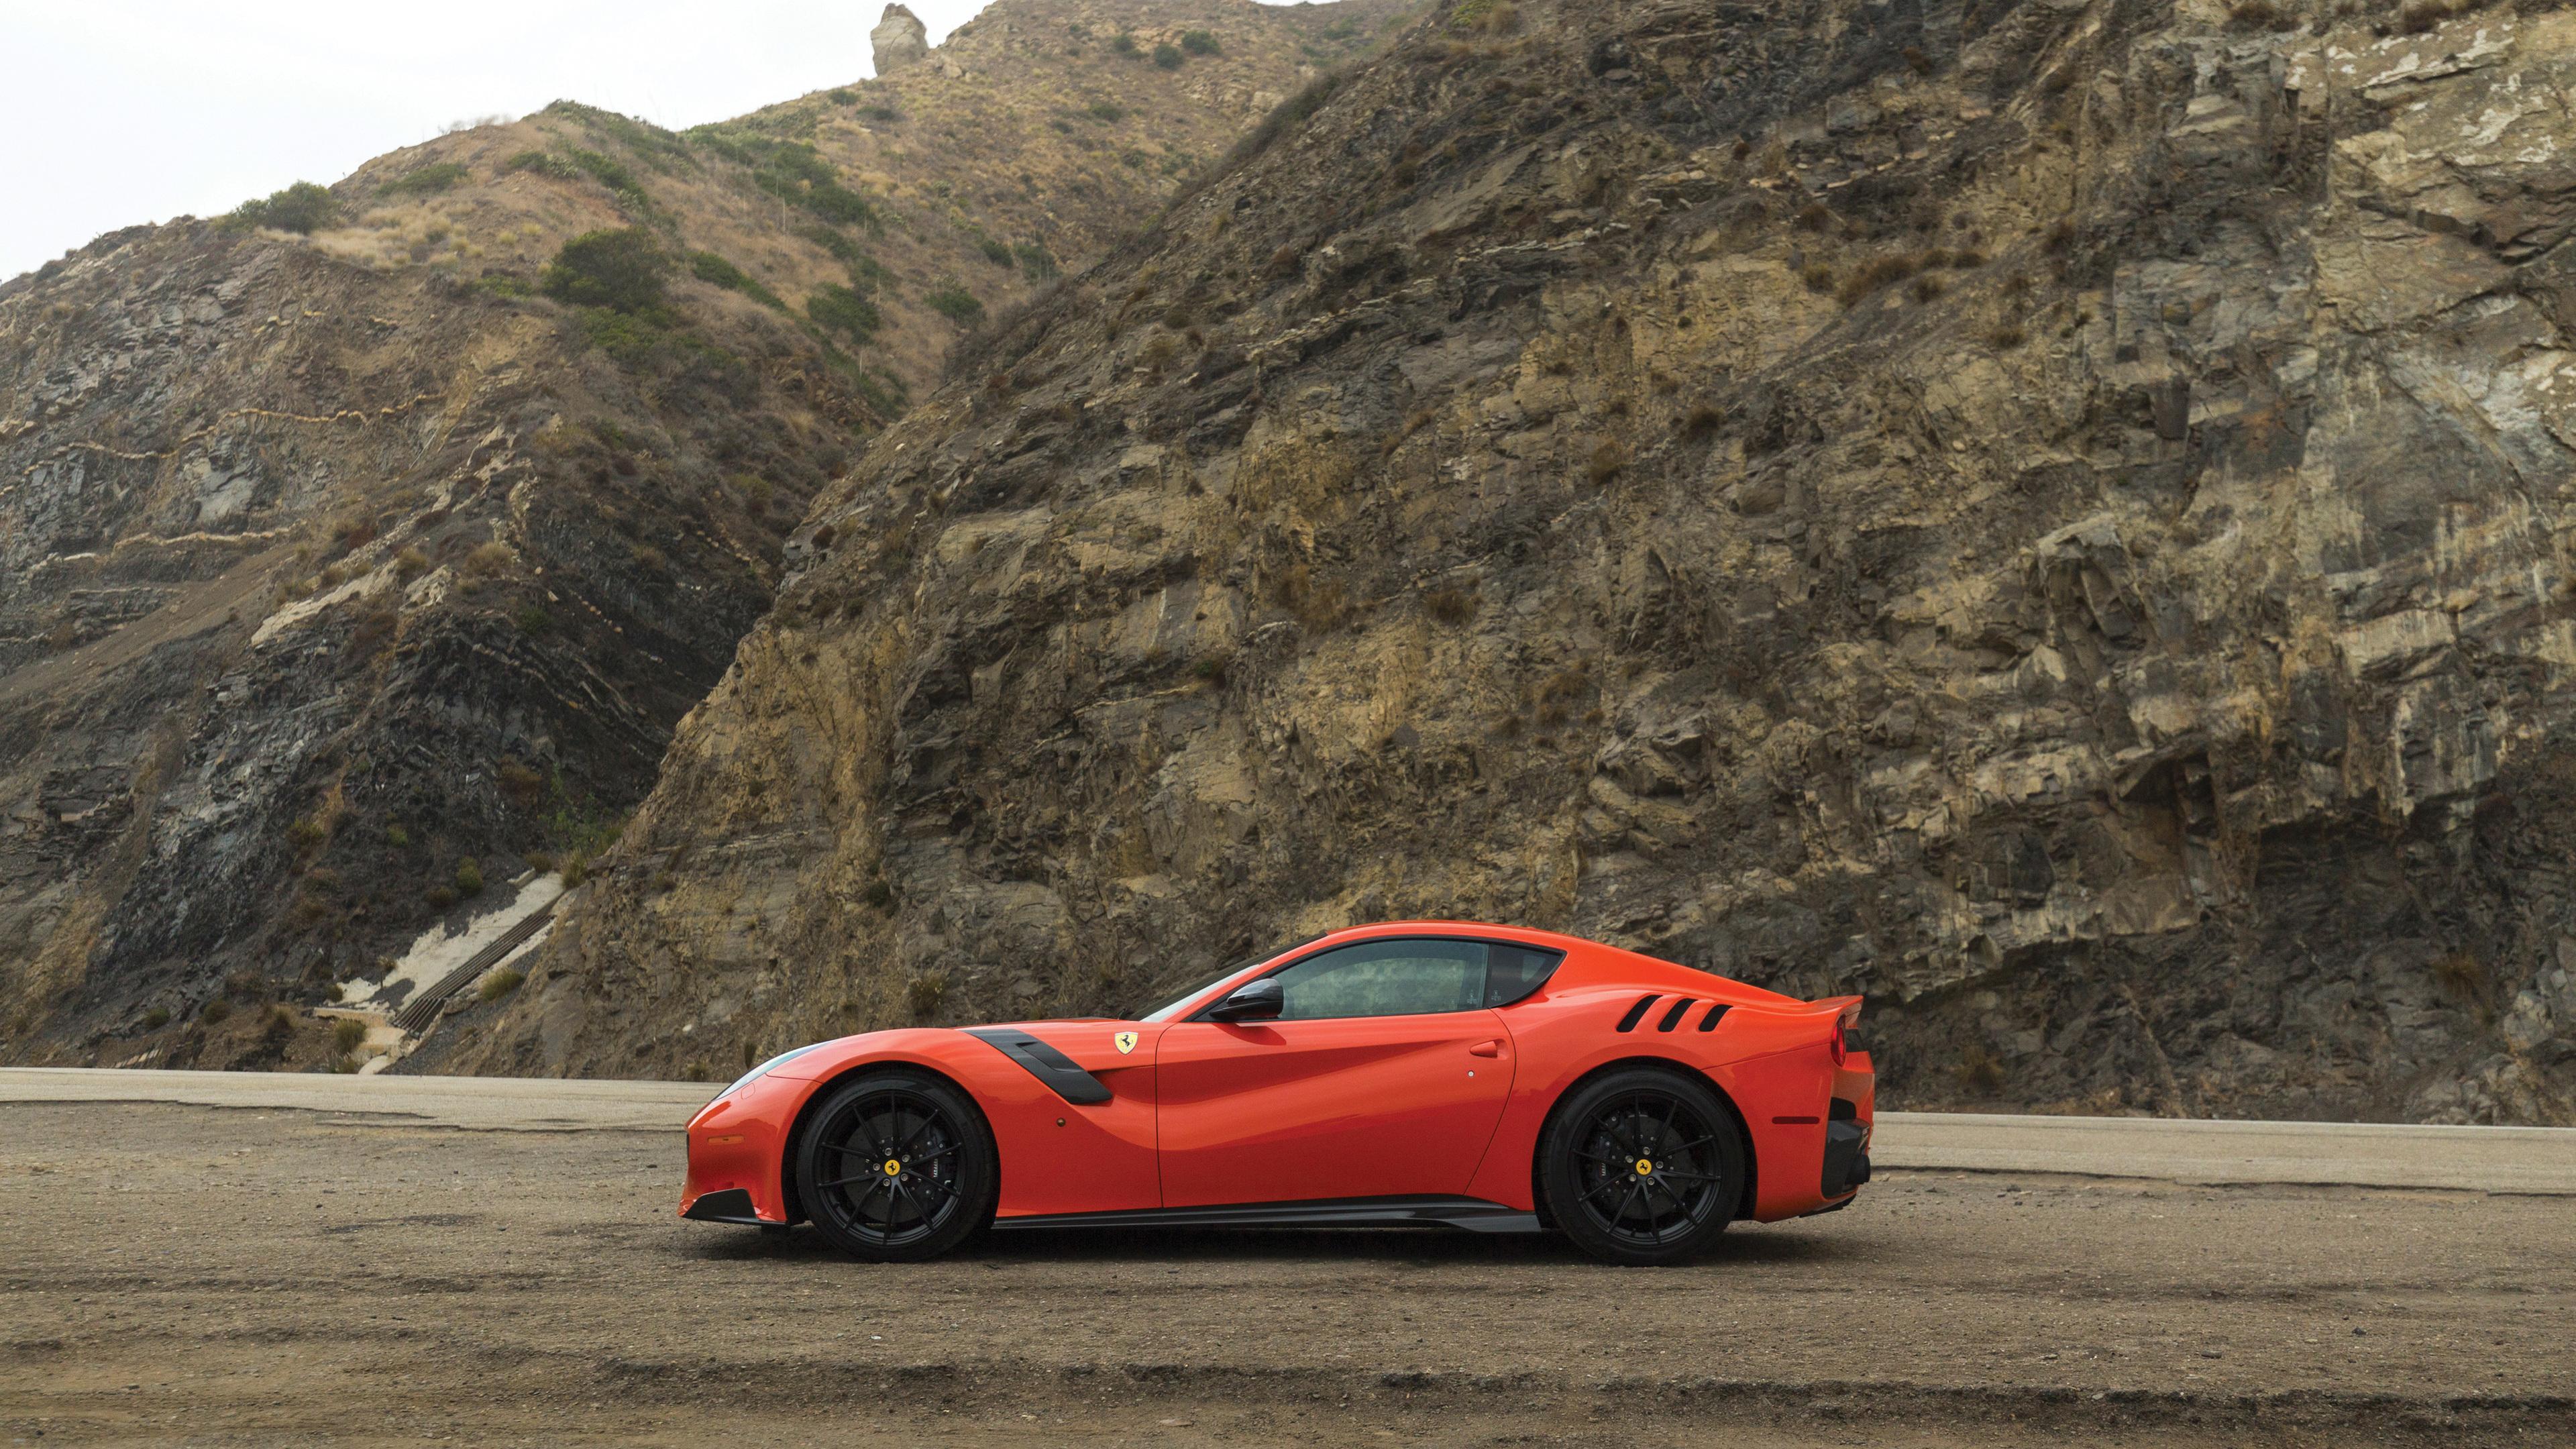 ferrari f12 tdf 1539107946 - Ferrari F12 Tdf - hd-wallpapers, ferrari wallpapers, ferrari f12 tdf wallpapers, cars wallpapers, 4k-wallpapers, 2017 cars wallpapers